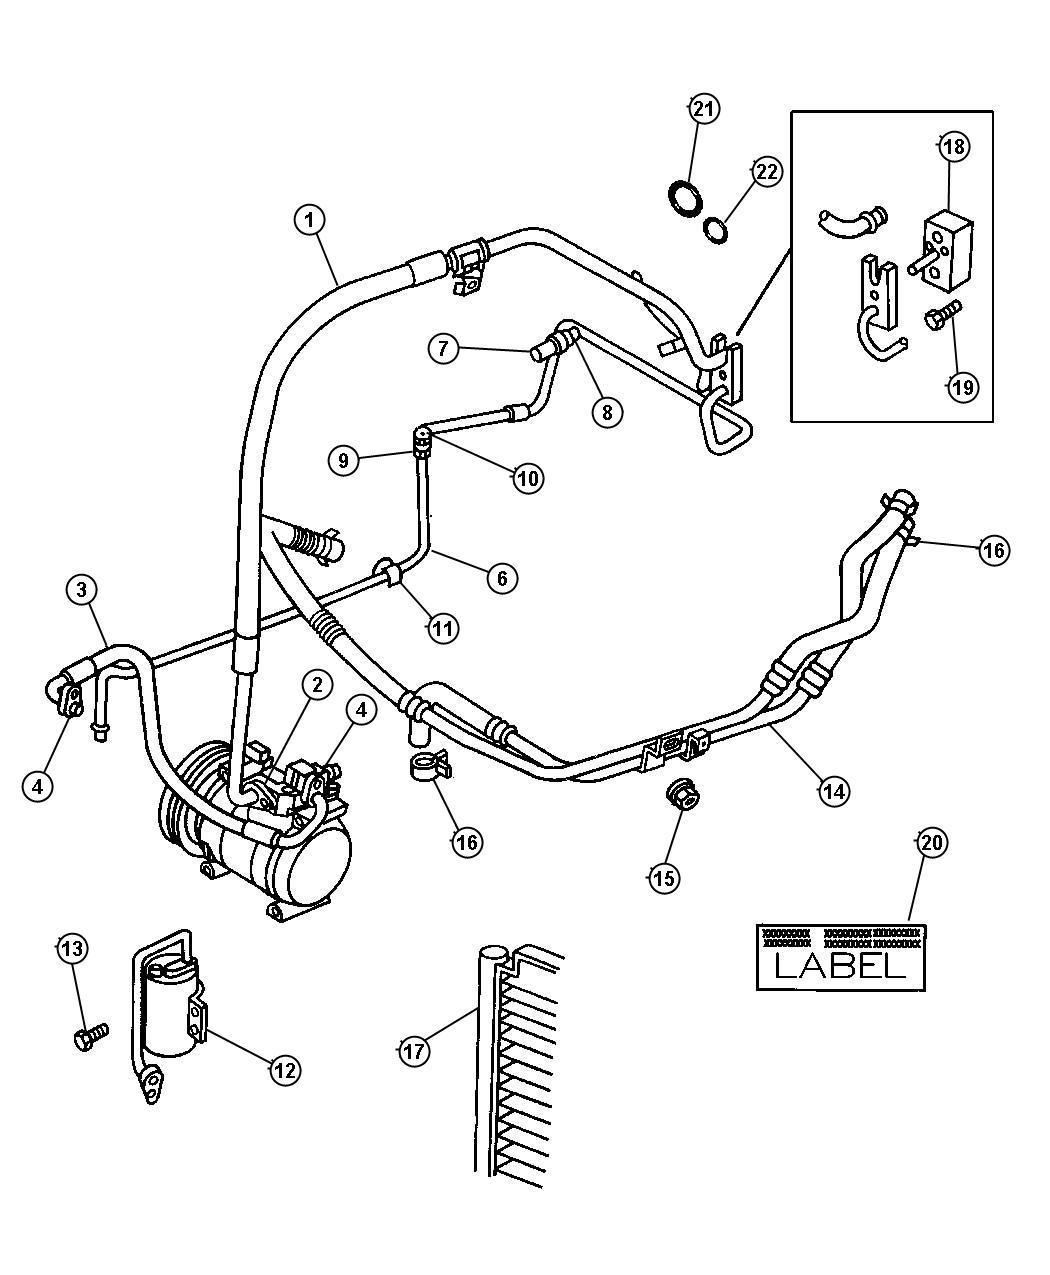 Dodge Grand Caravan O ring. A/c line, a/c suction line